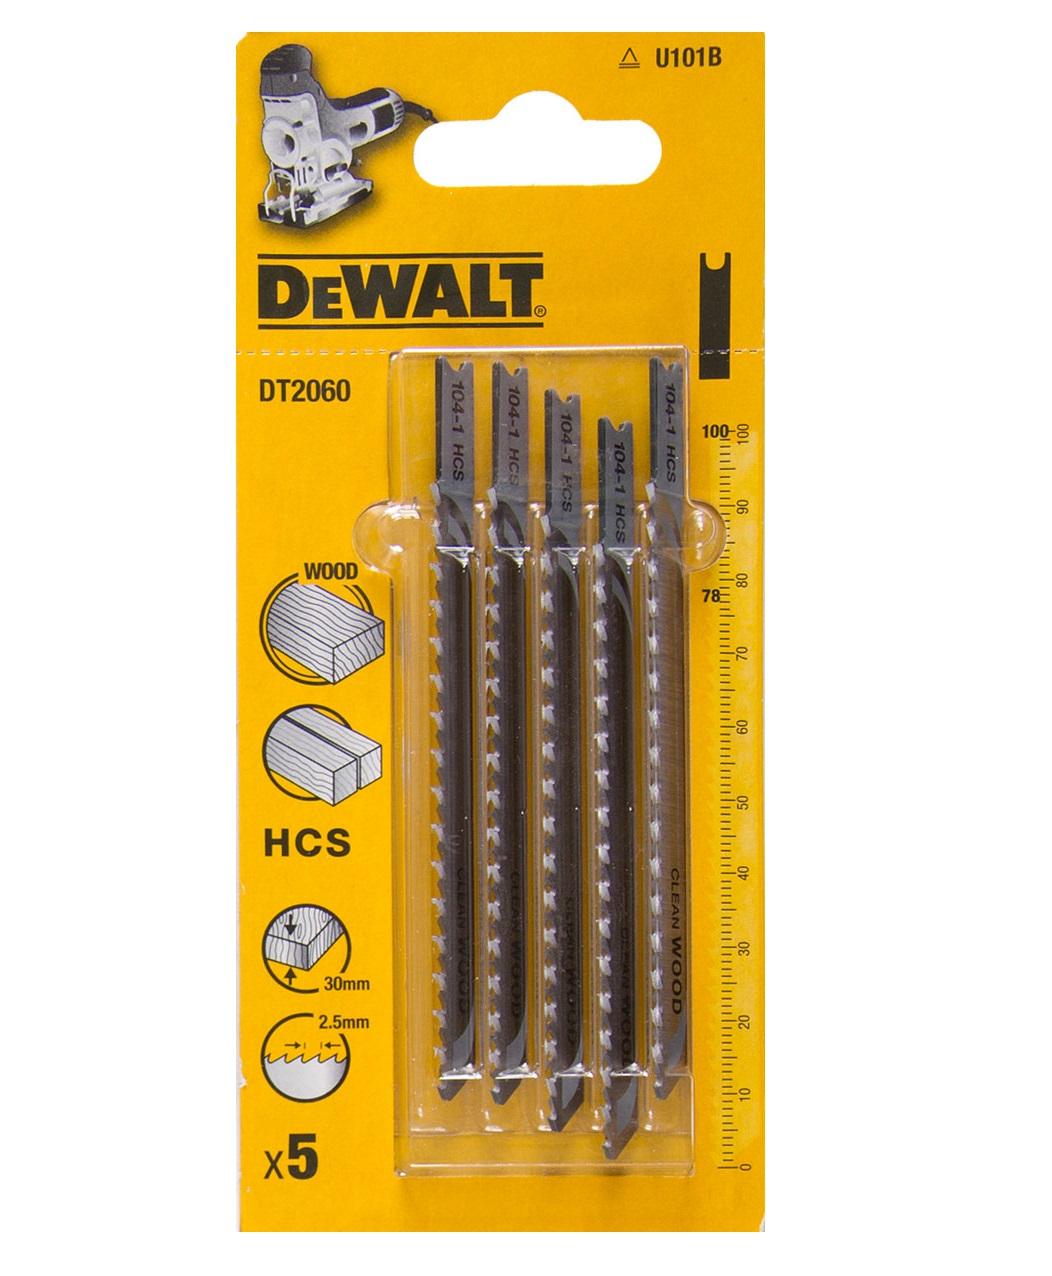 DT2060 DeWALT pilový plátek HCS 100 mm na dřevo 5ks